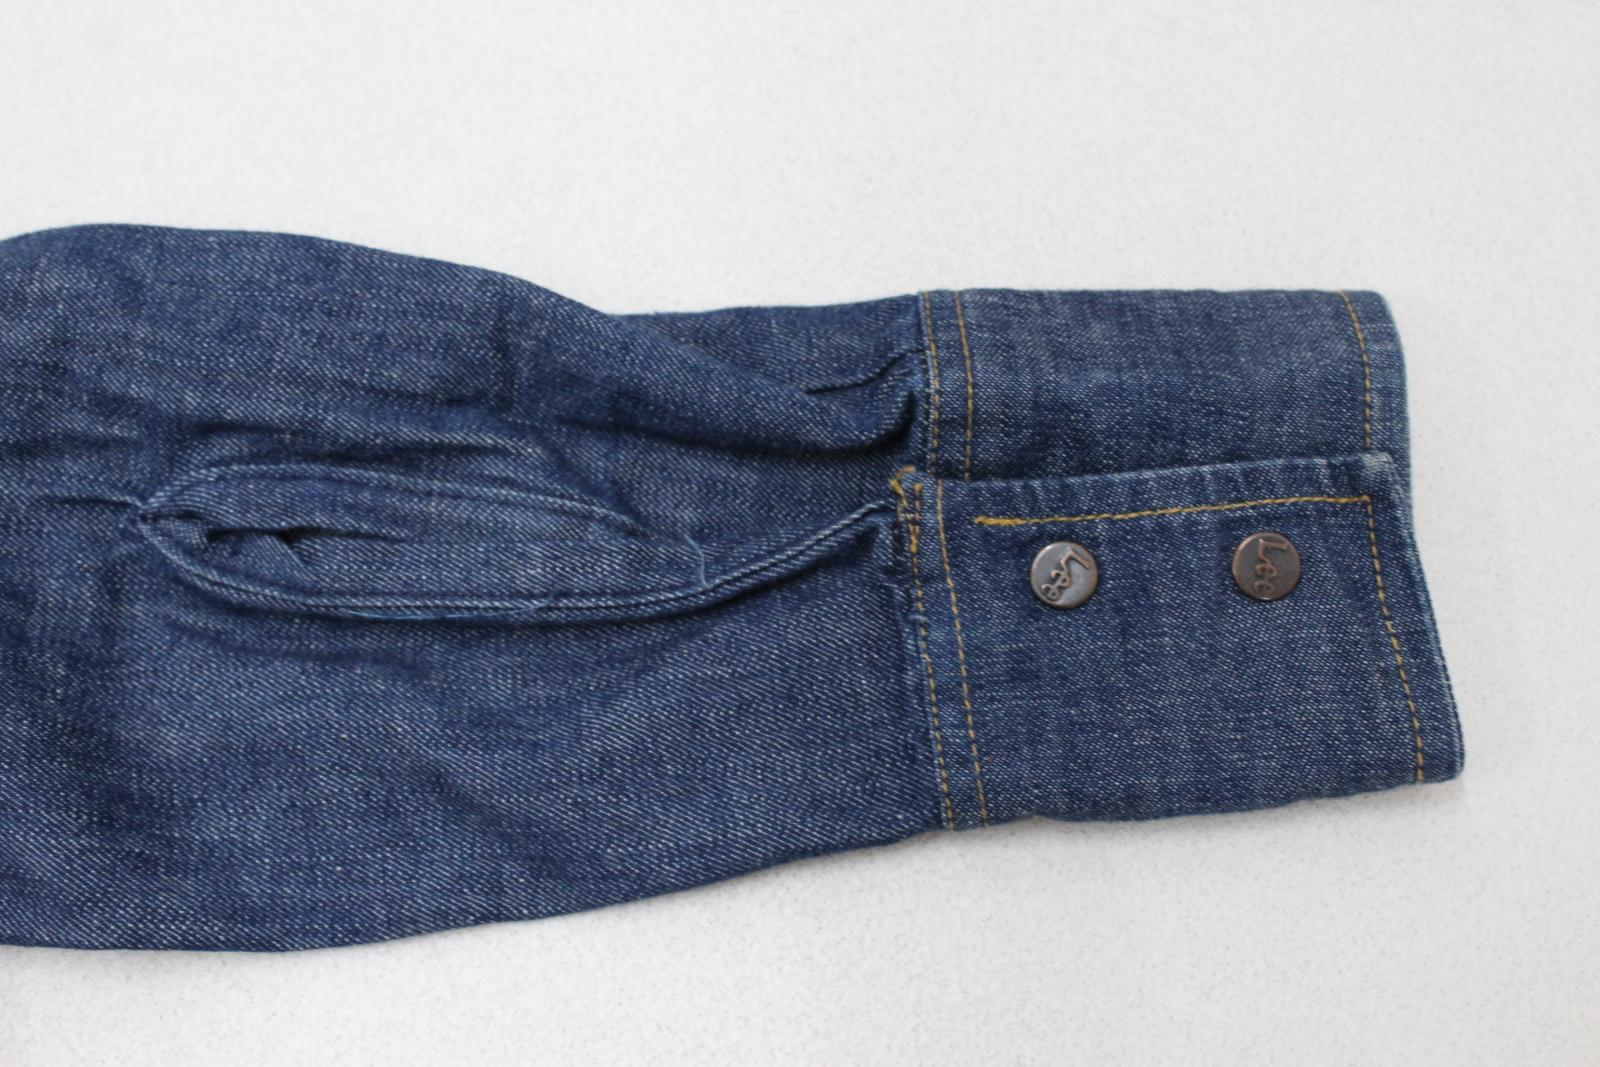 Lee-Jeans-de-hombre-Vintage-Denim-Azul-Algodon-con-Corchetes-Cierre-Mangas-Largas-Camisa-S miniatura 8